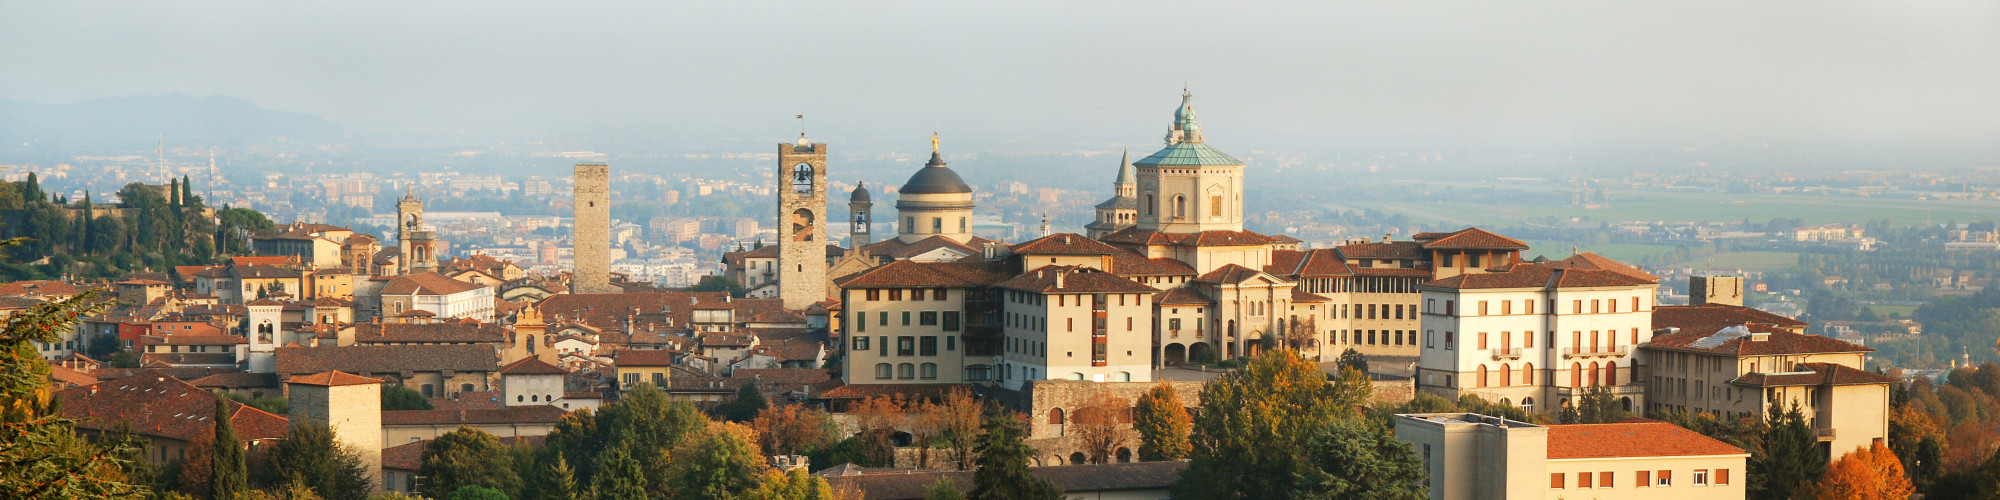 cropped-Bergamo21.jpg